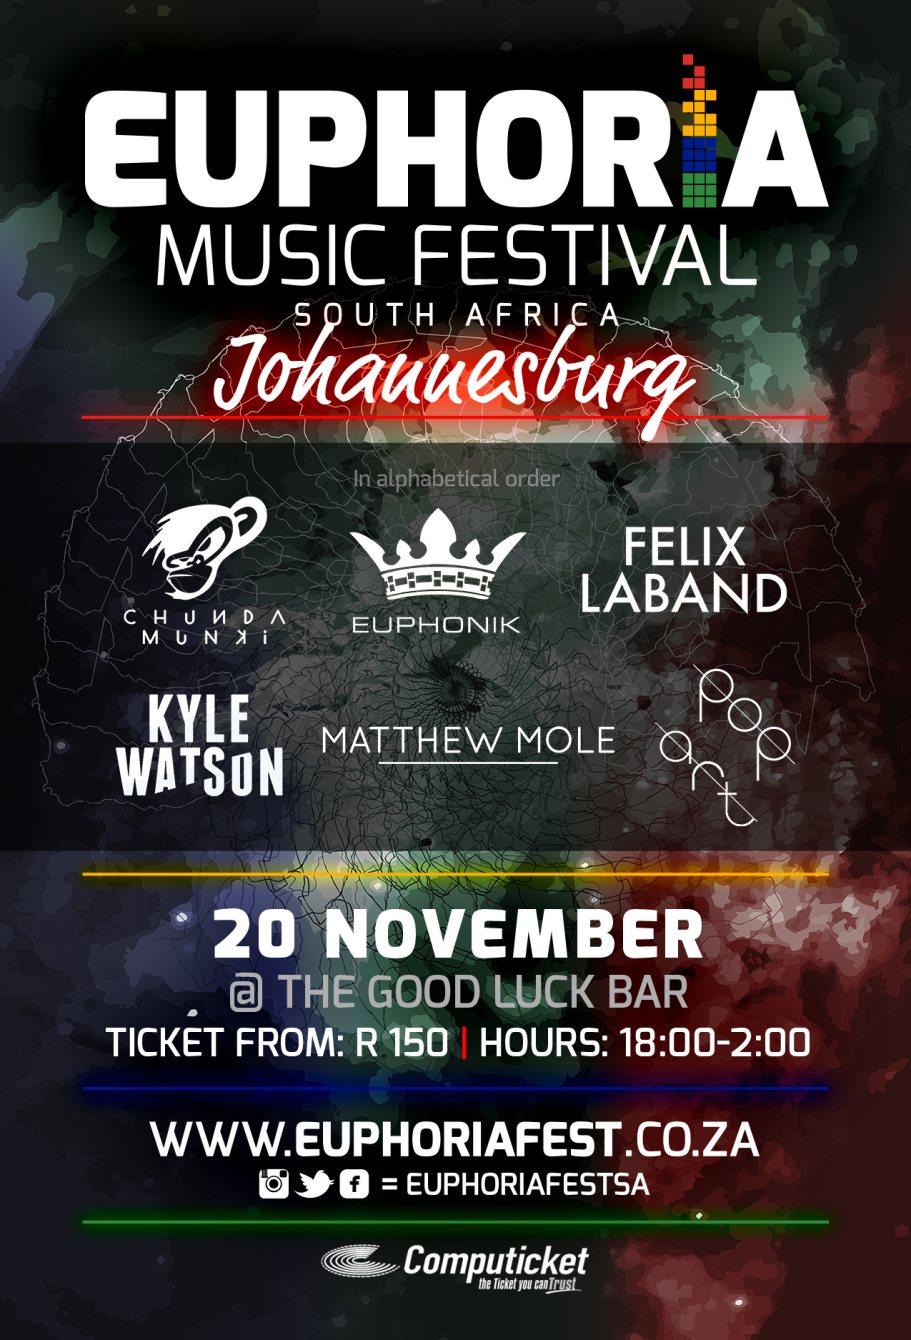 Euphoria Music Festival Johannesburg - Flyer front